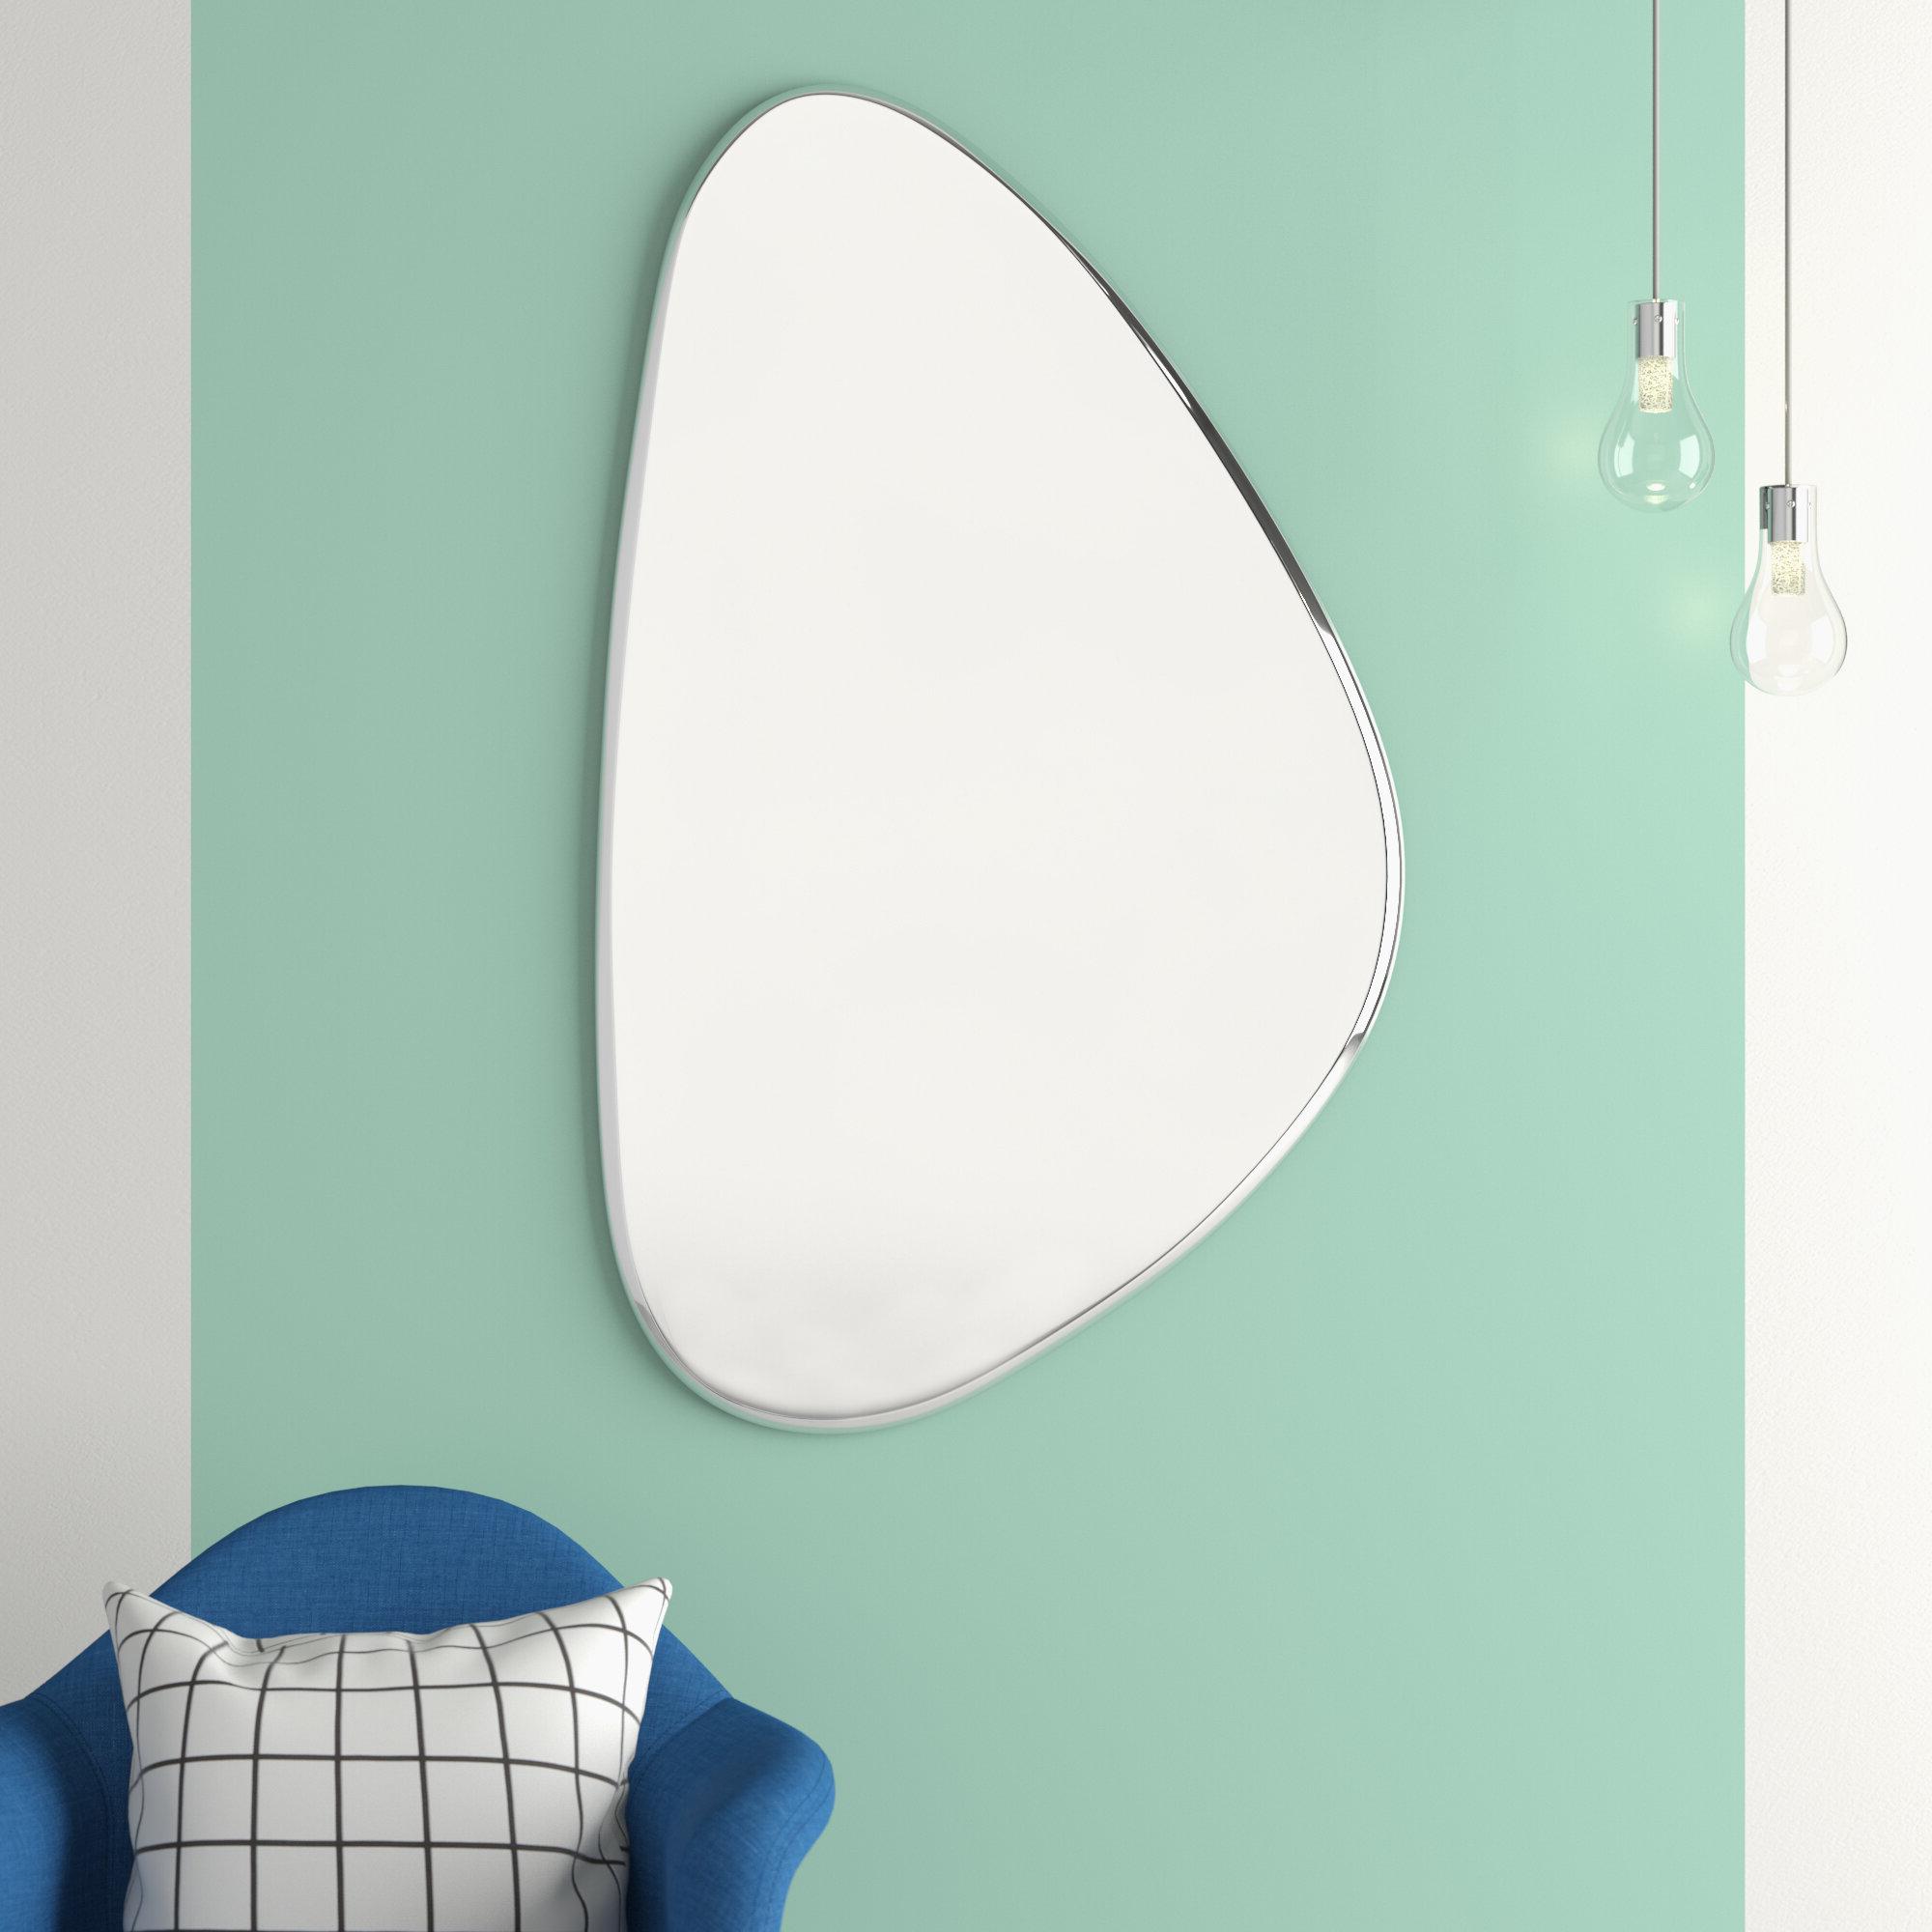 Newest Big Frameless Wall Mirrors With Regard To Clintonville Frameless Wall Mirror (Gallery 11 of 20)